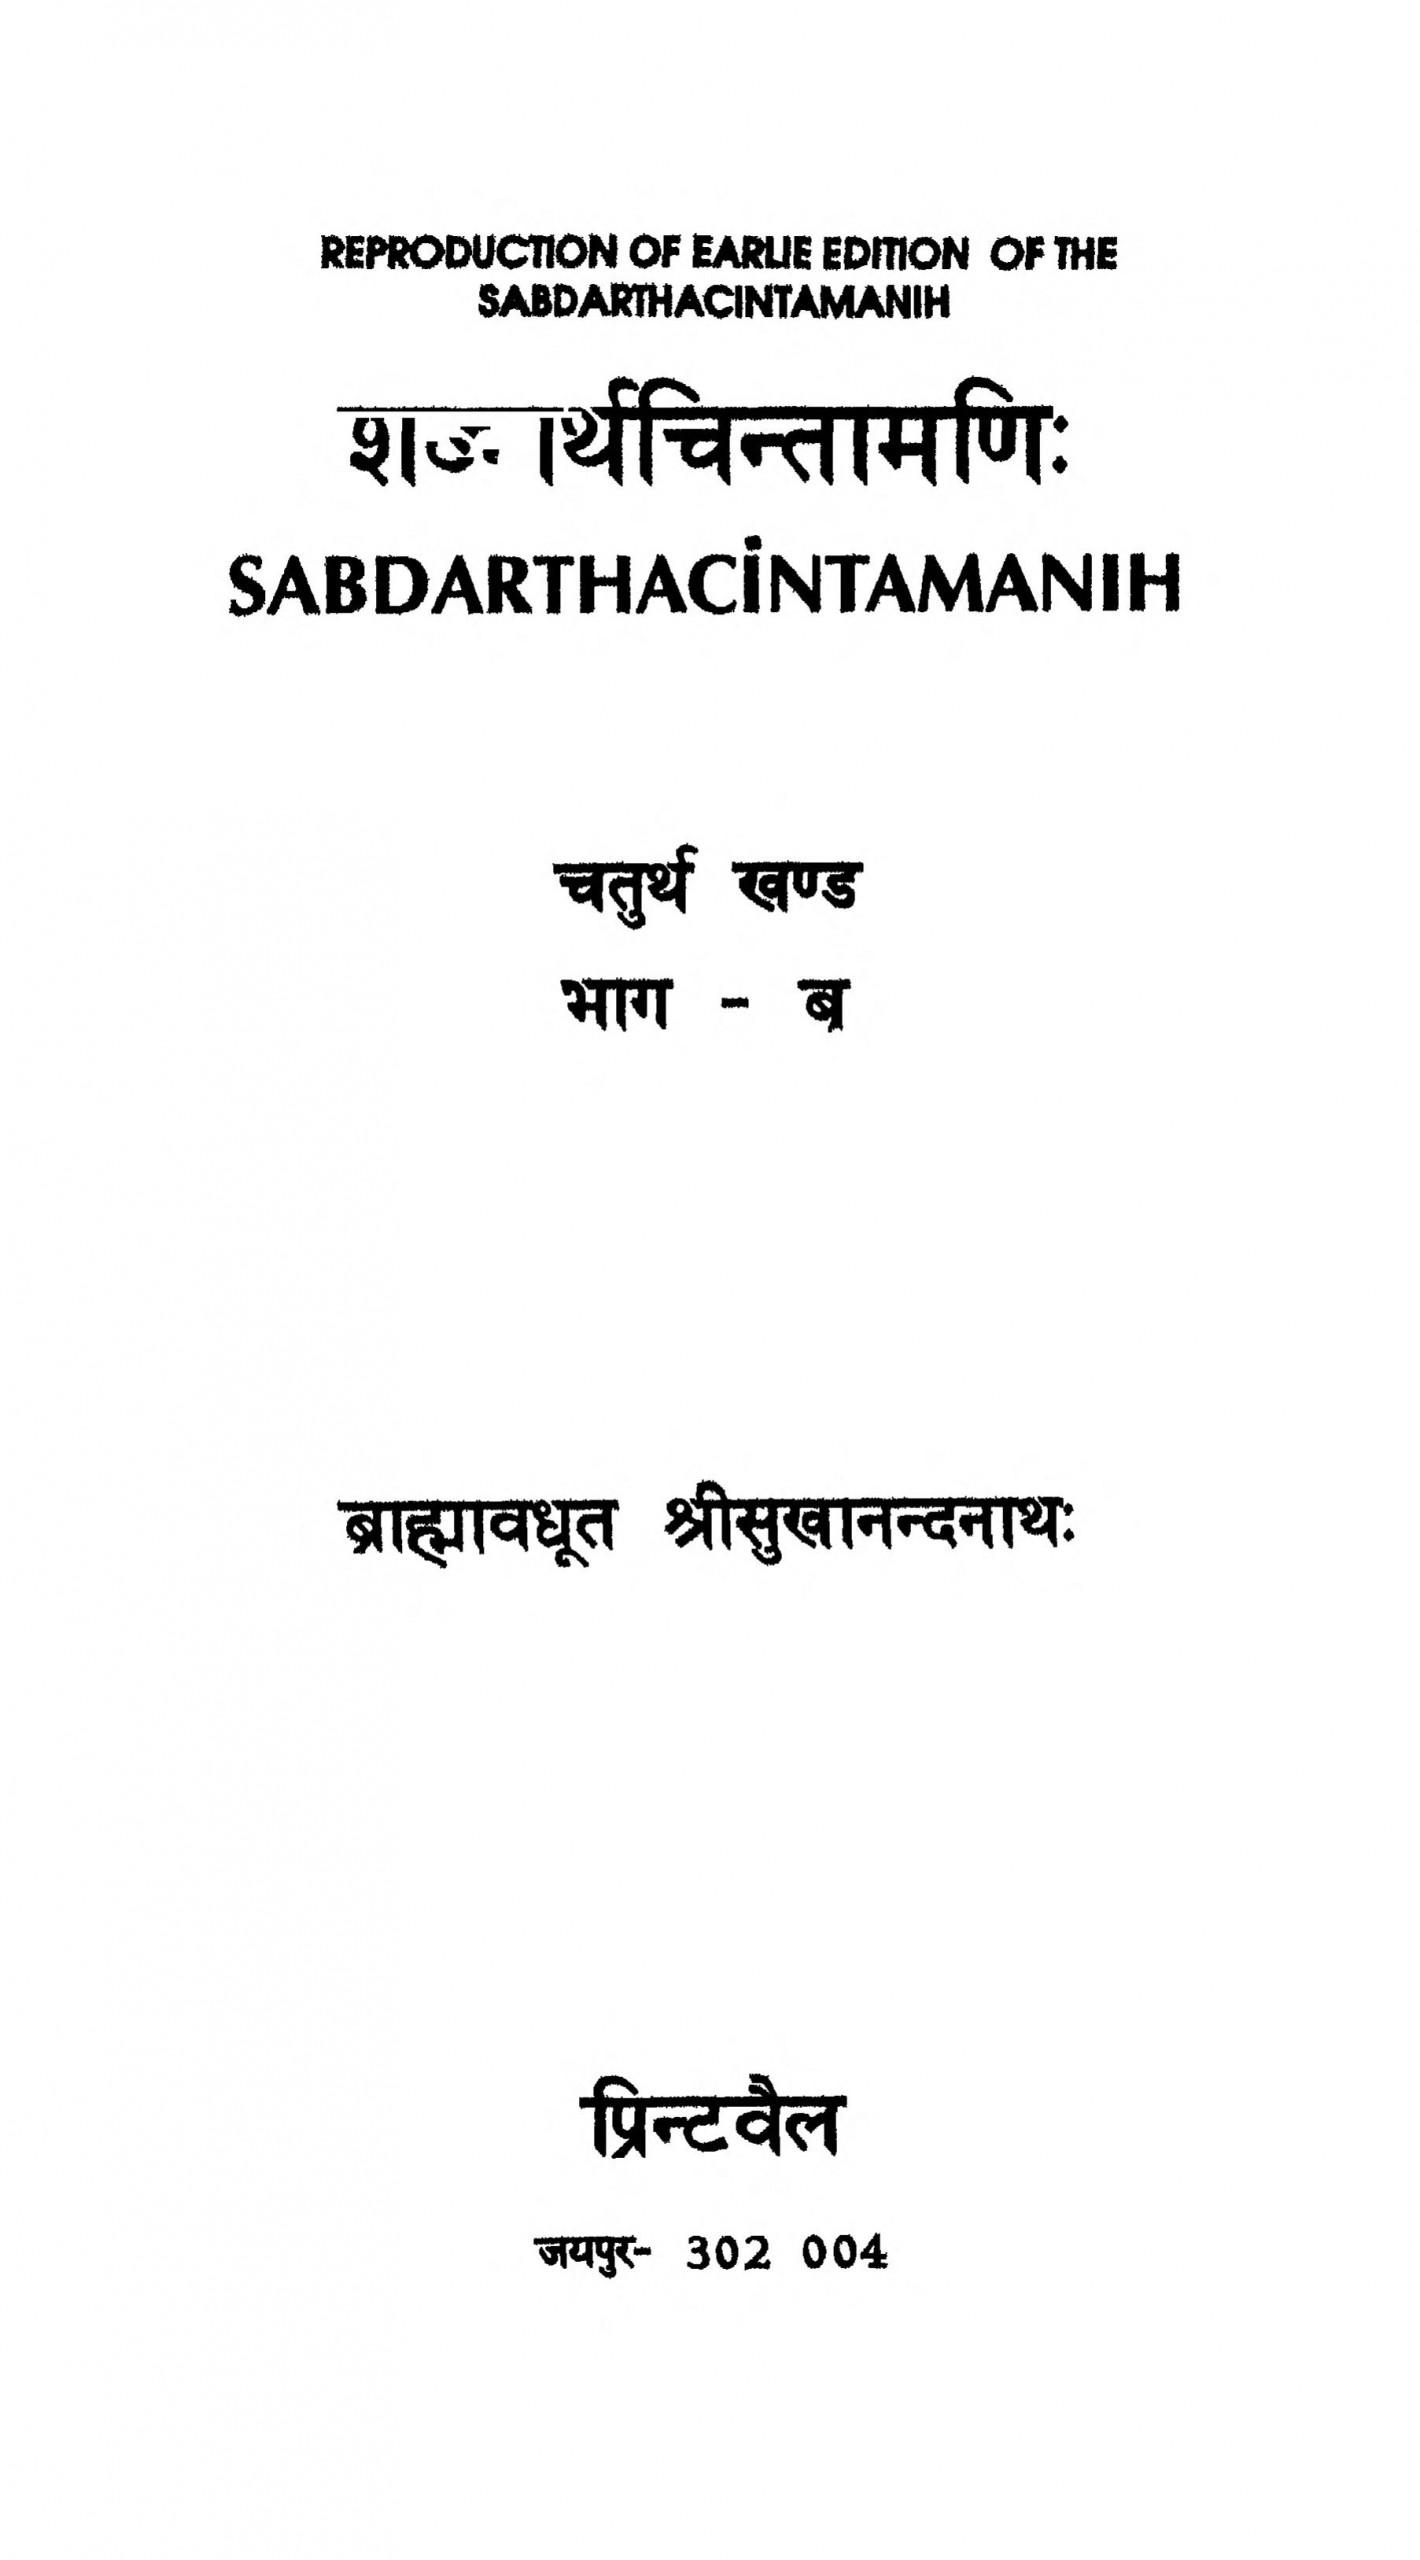 Book Image : शब्दार्थ चिन्तामणि - Sabdartha Chintamani